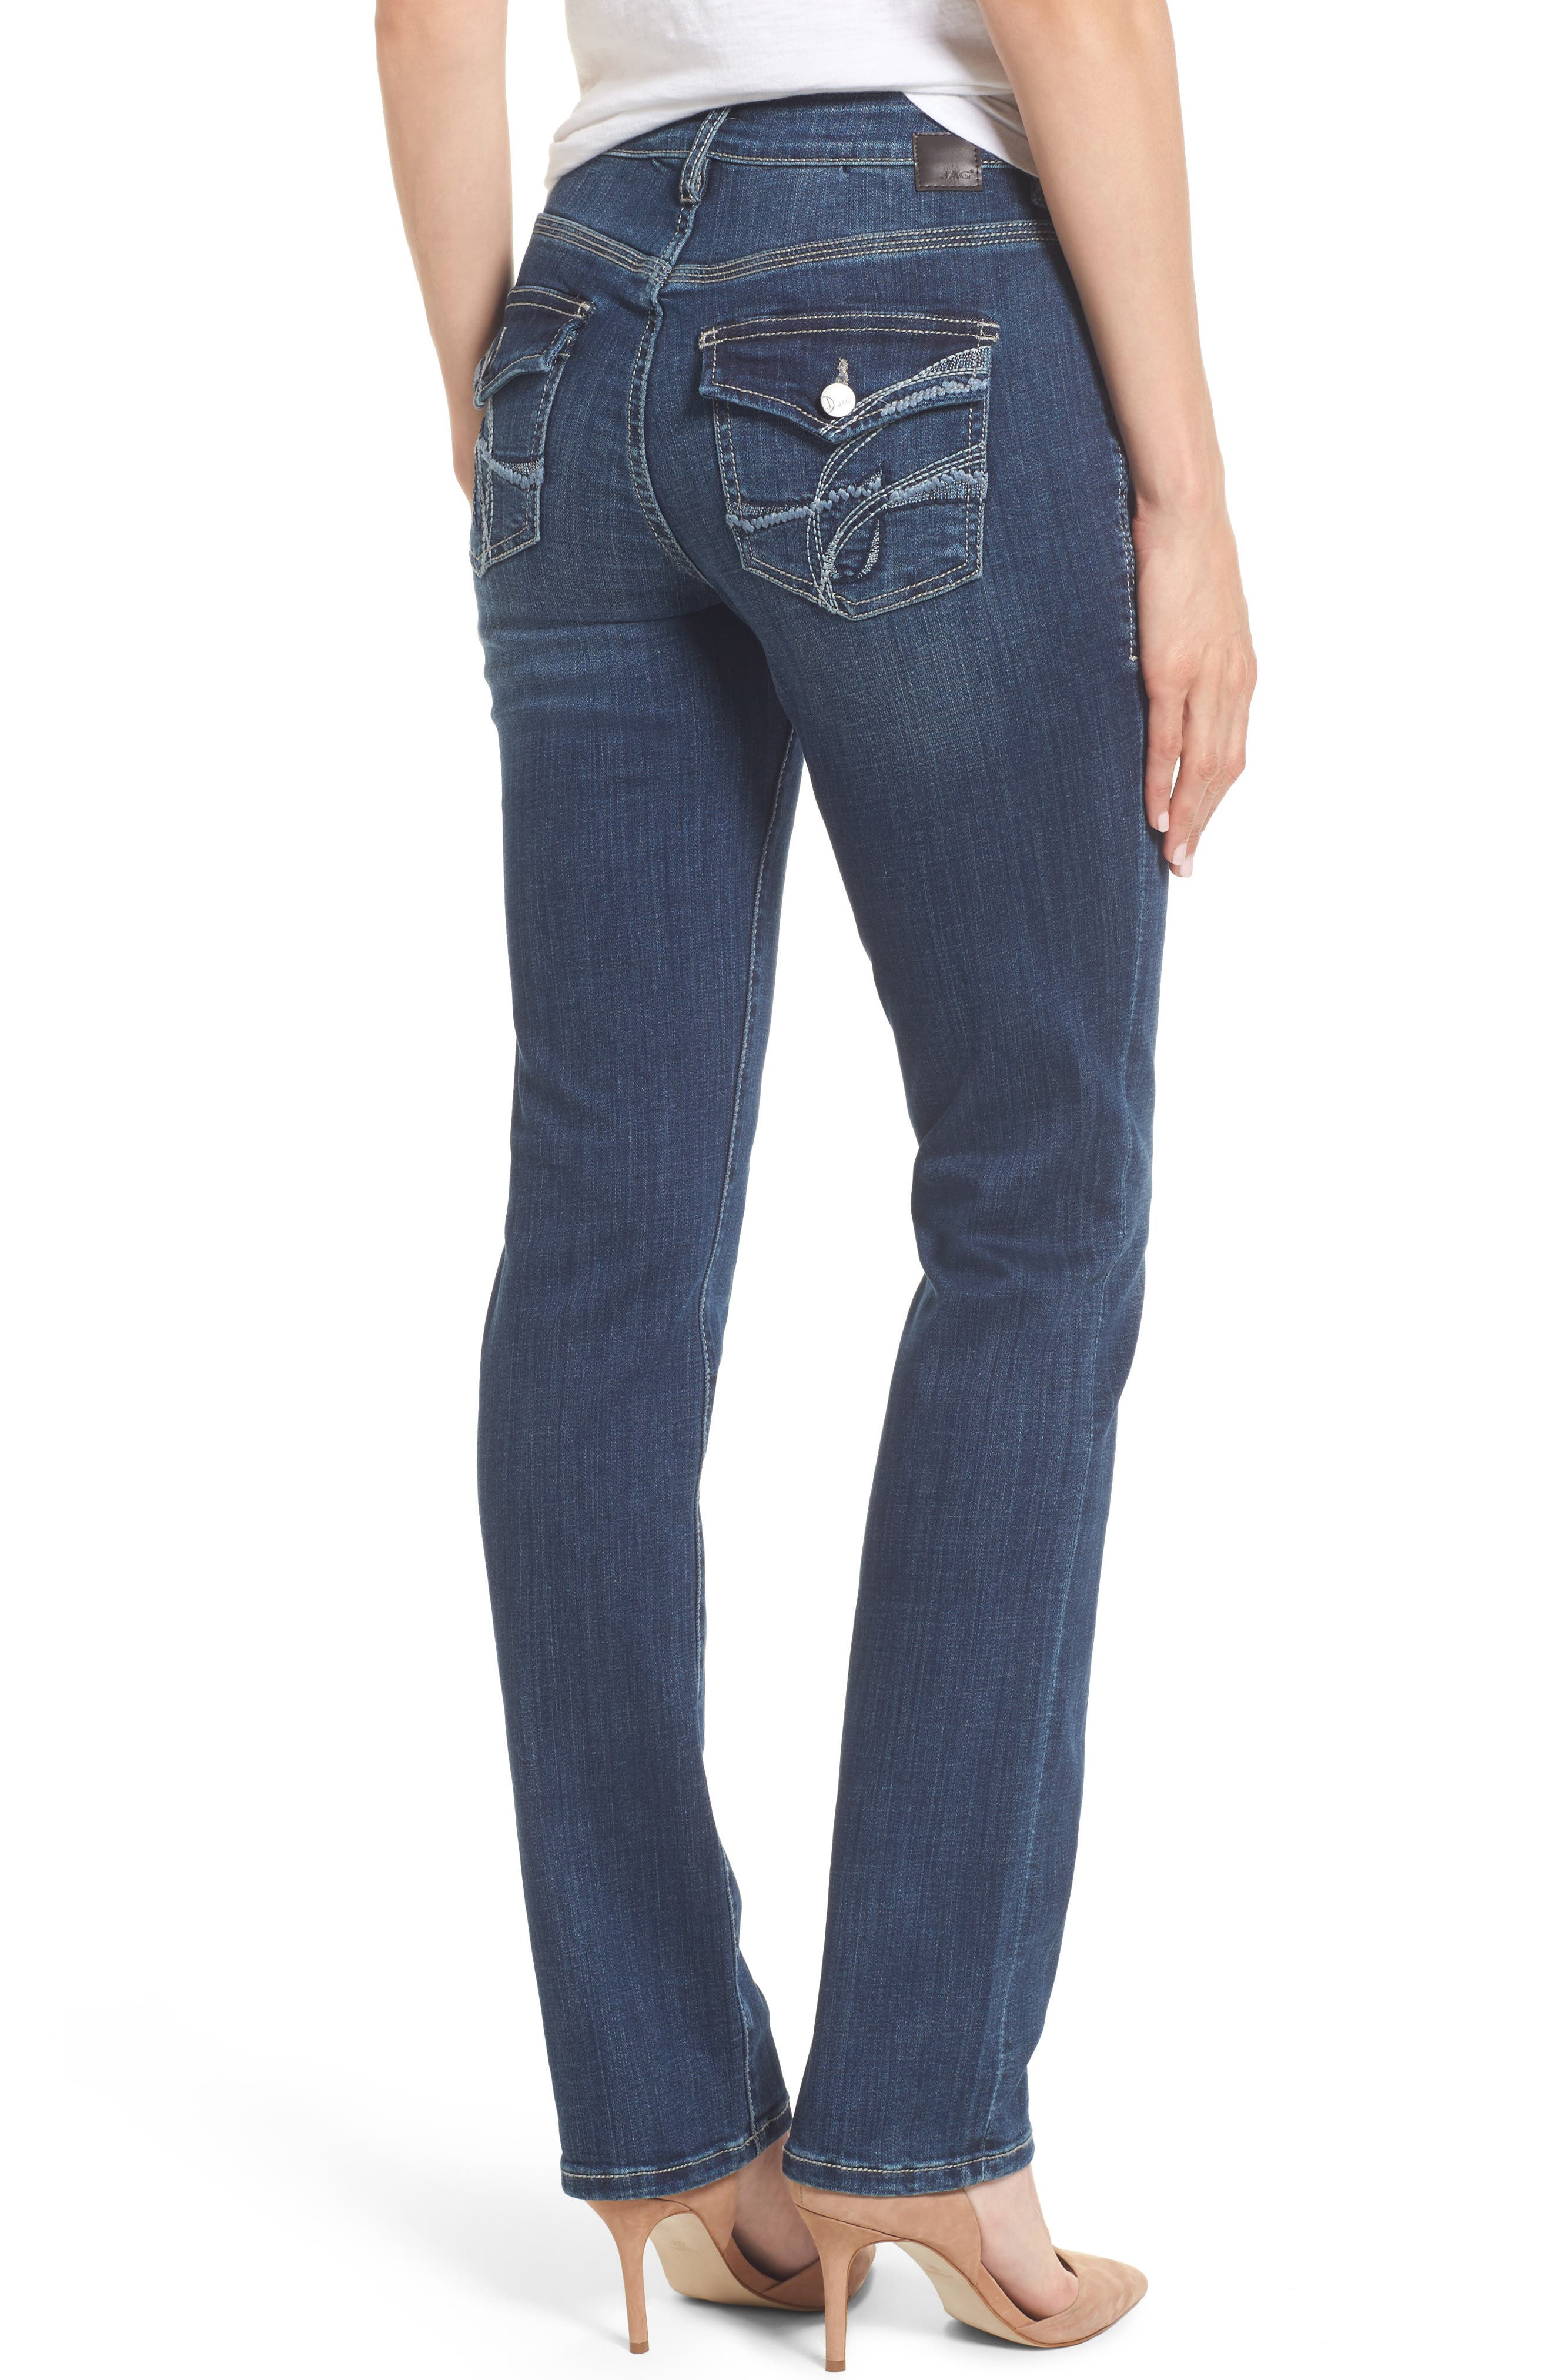 Adrian Straight Leg Jeans,                             Alternate thumbnail 2, color,